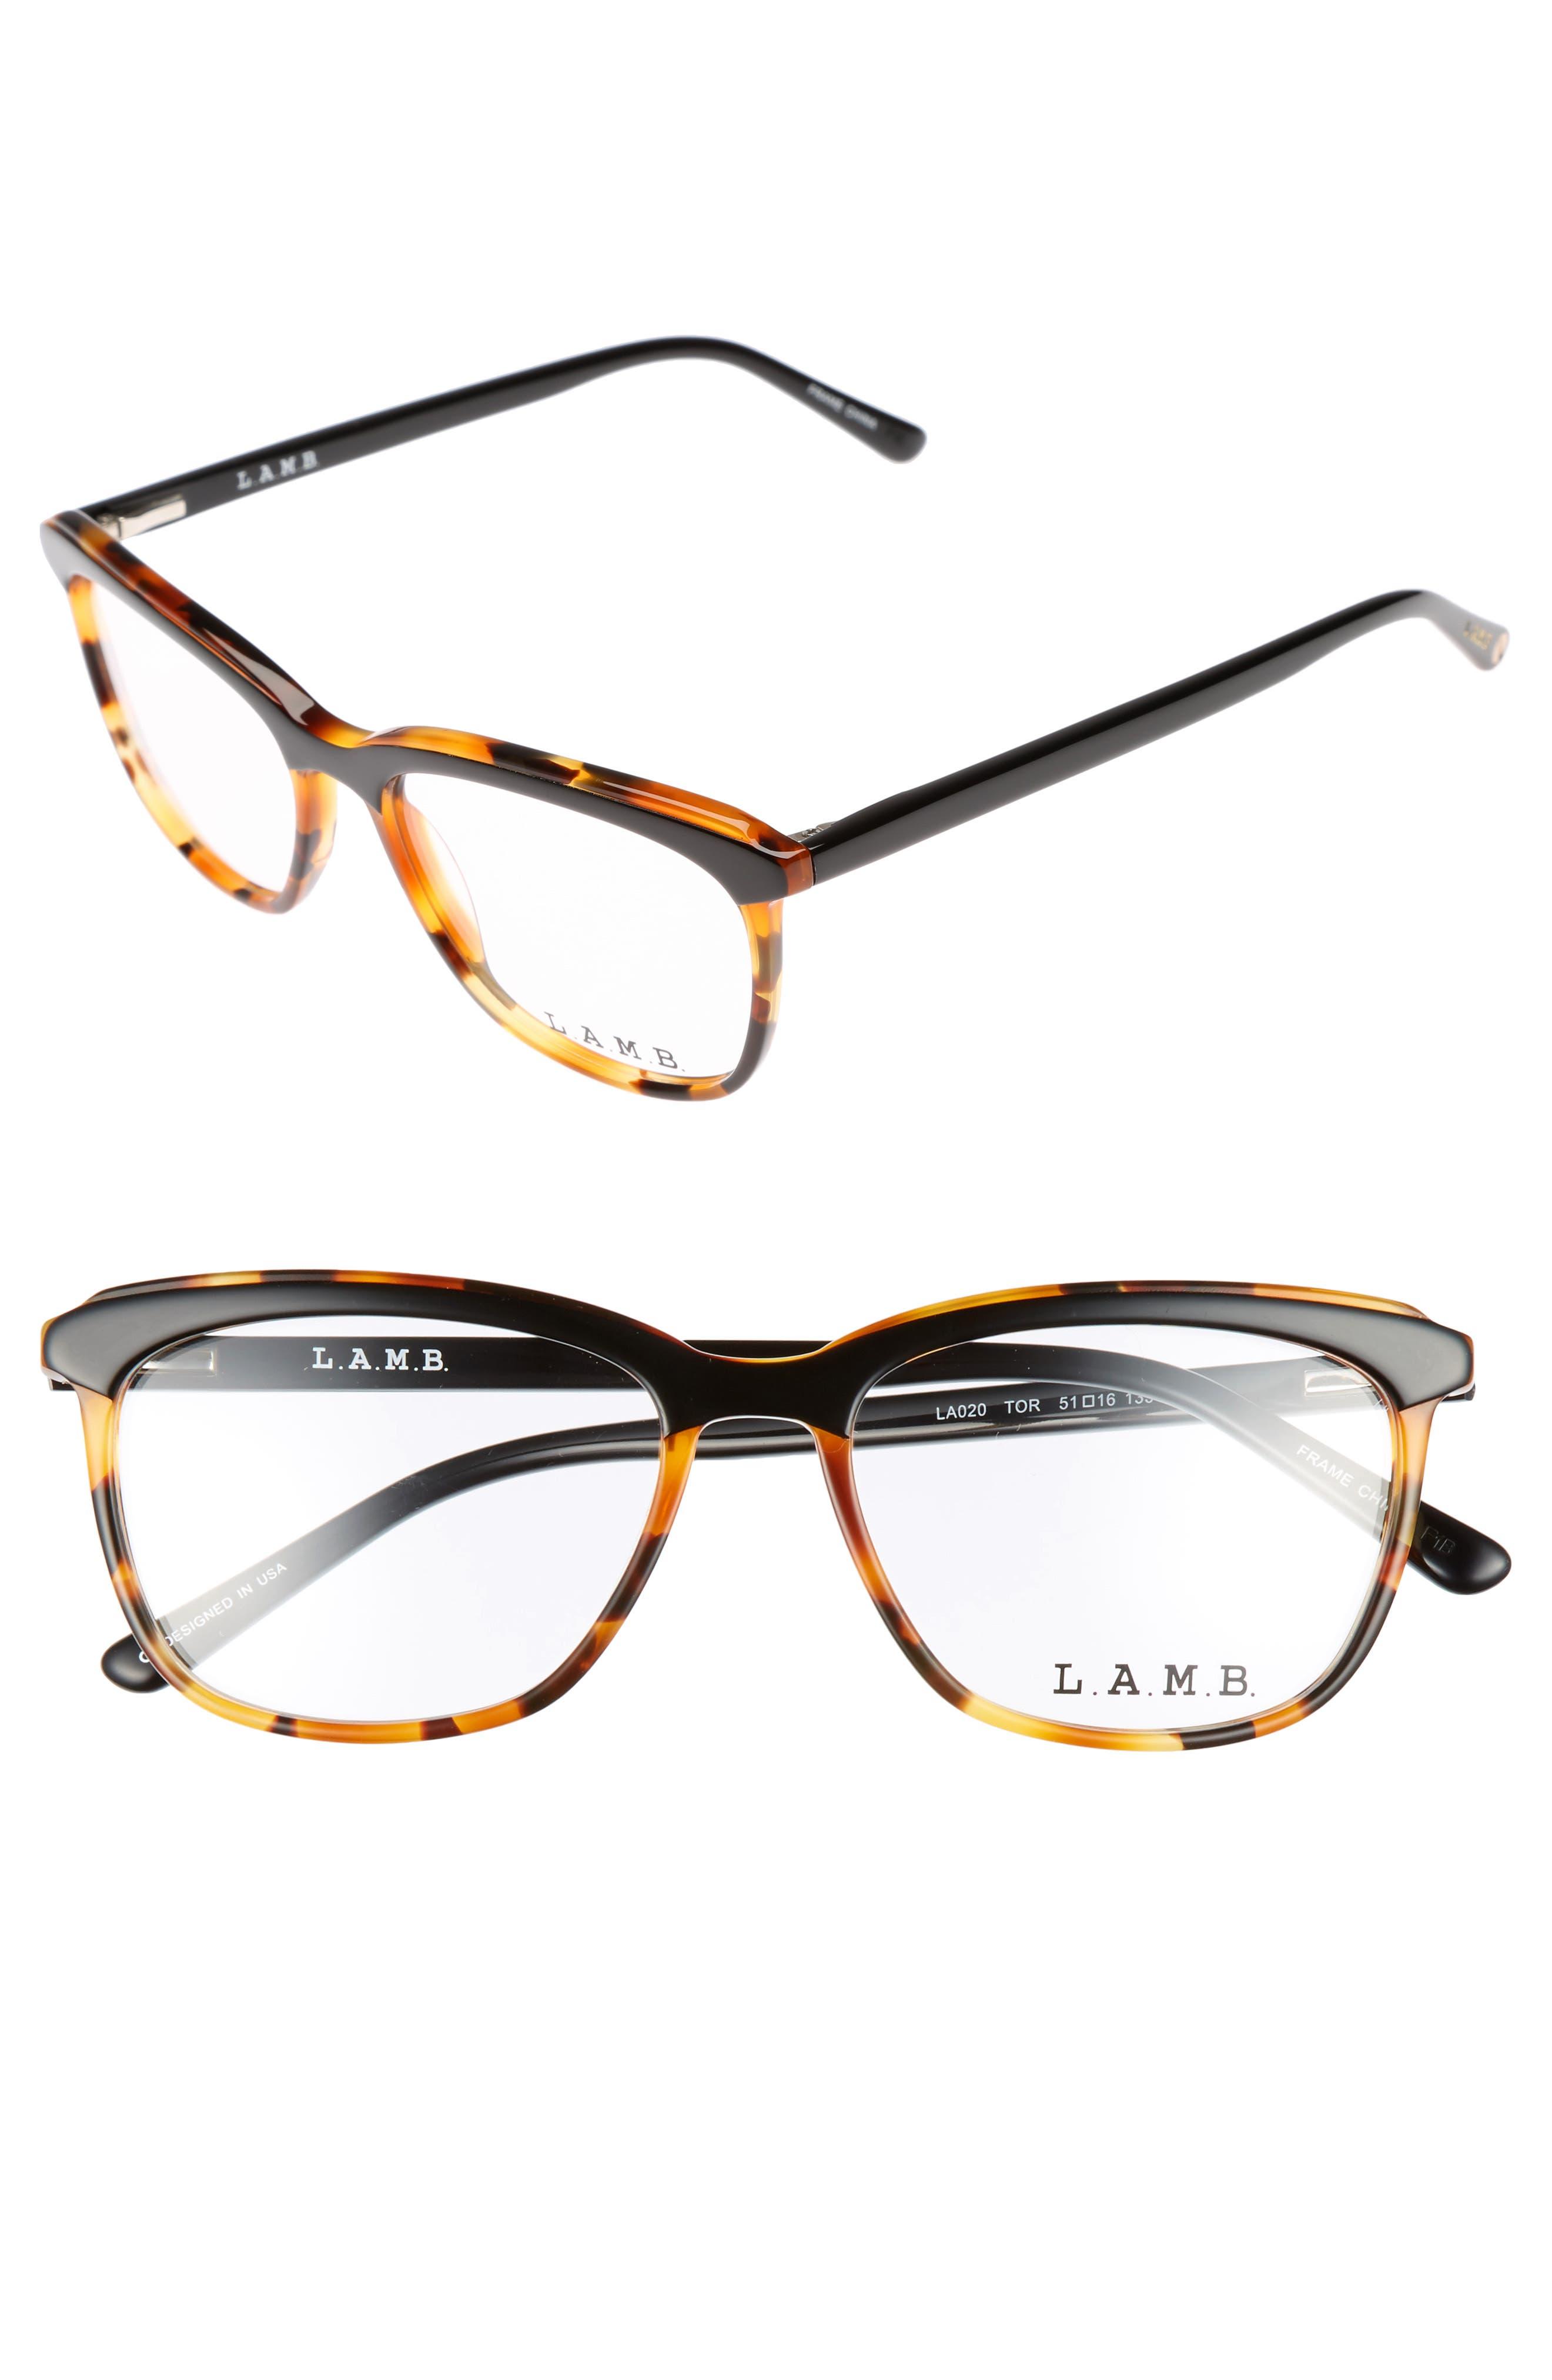 51mm Optical Square Glasses,                         Main,                         color, 001